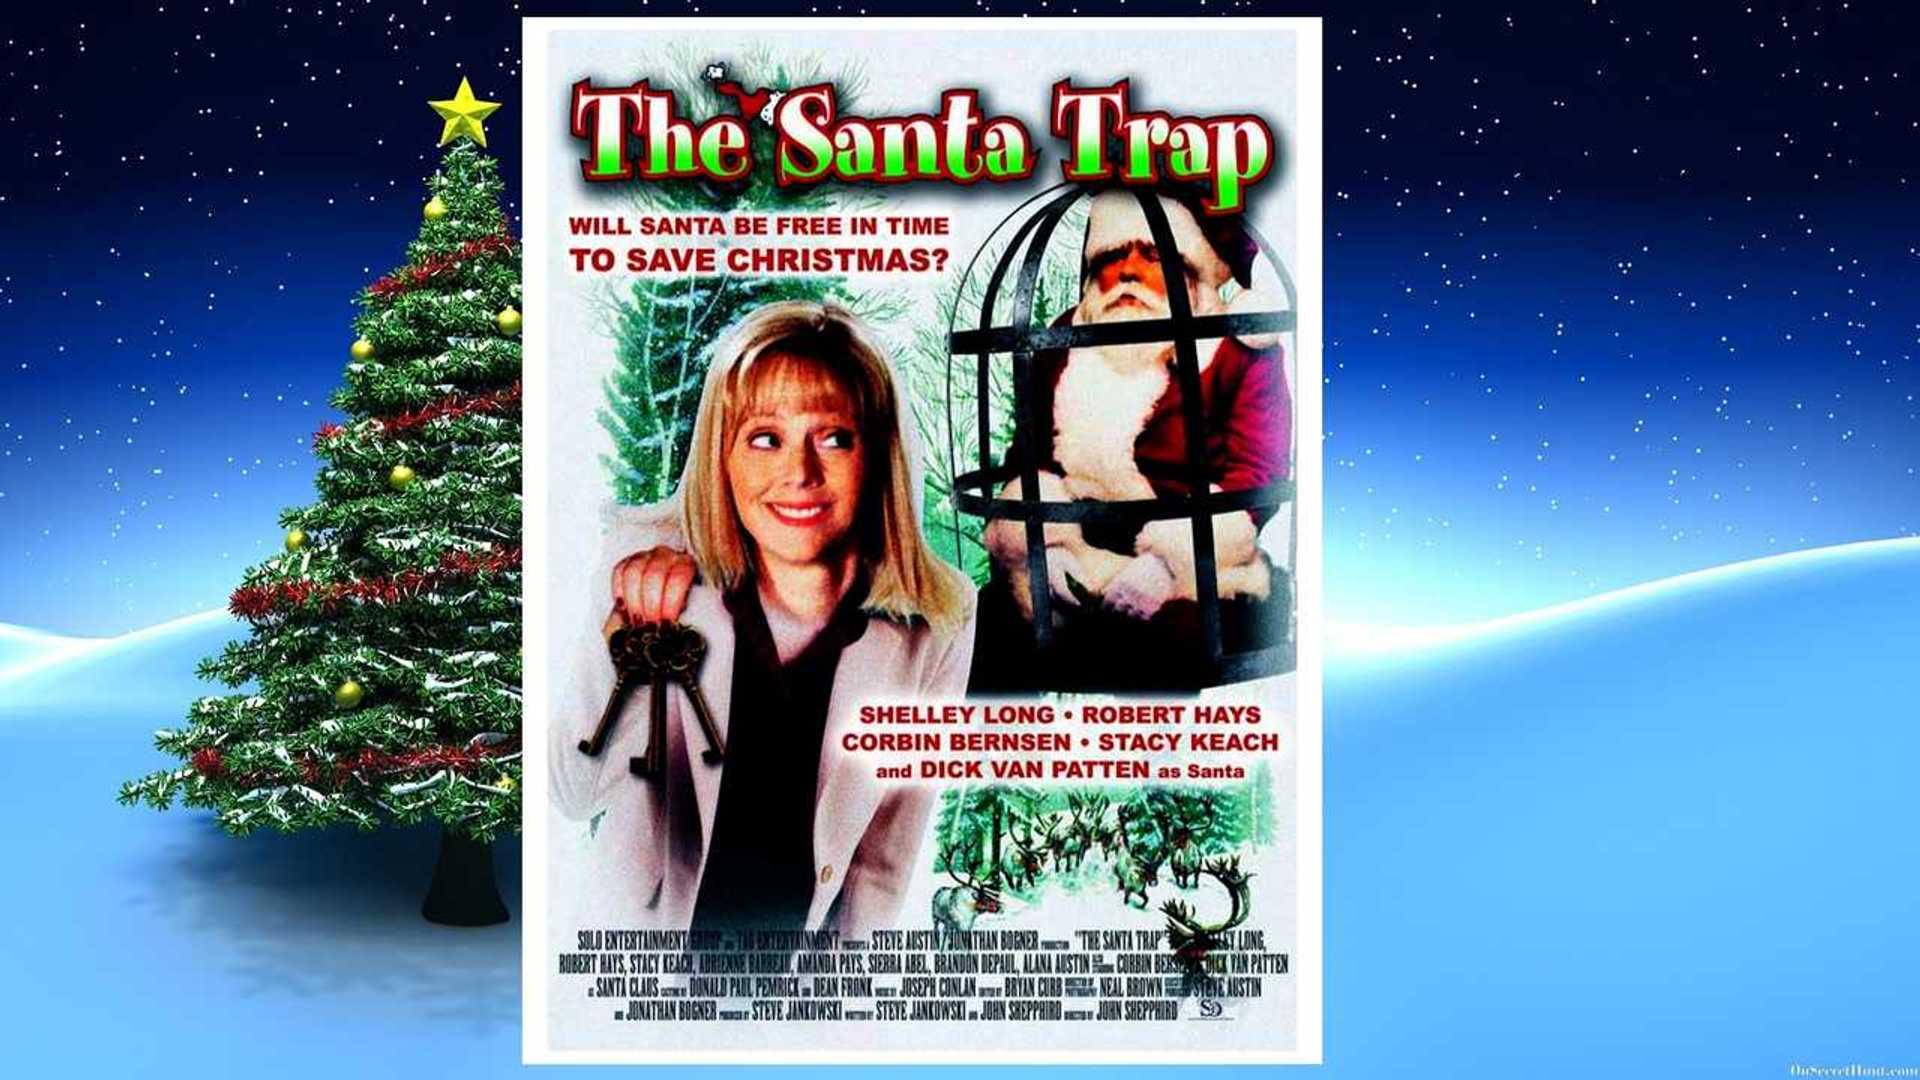 Moto Movie Review: The Santa Trap (2002)